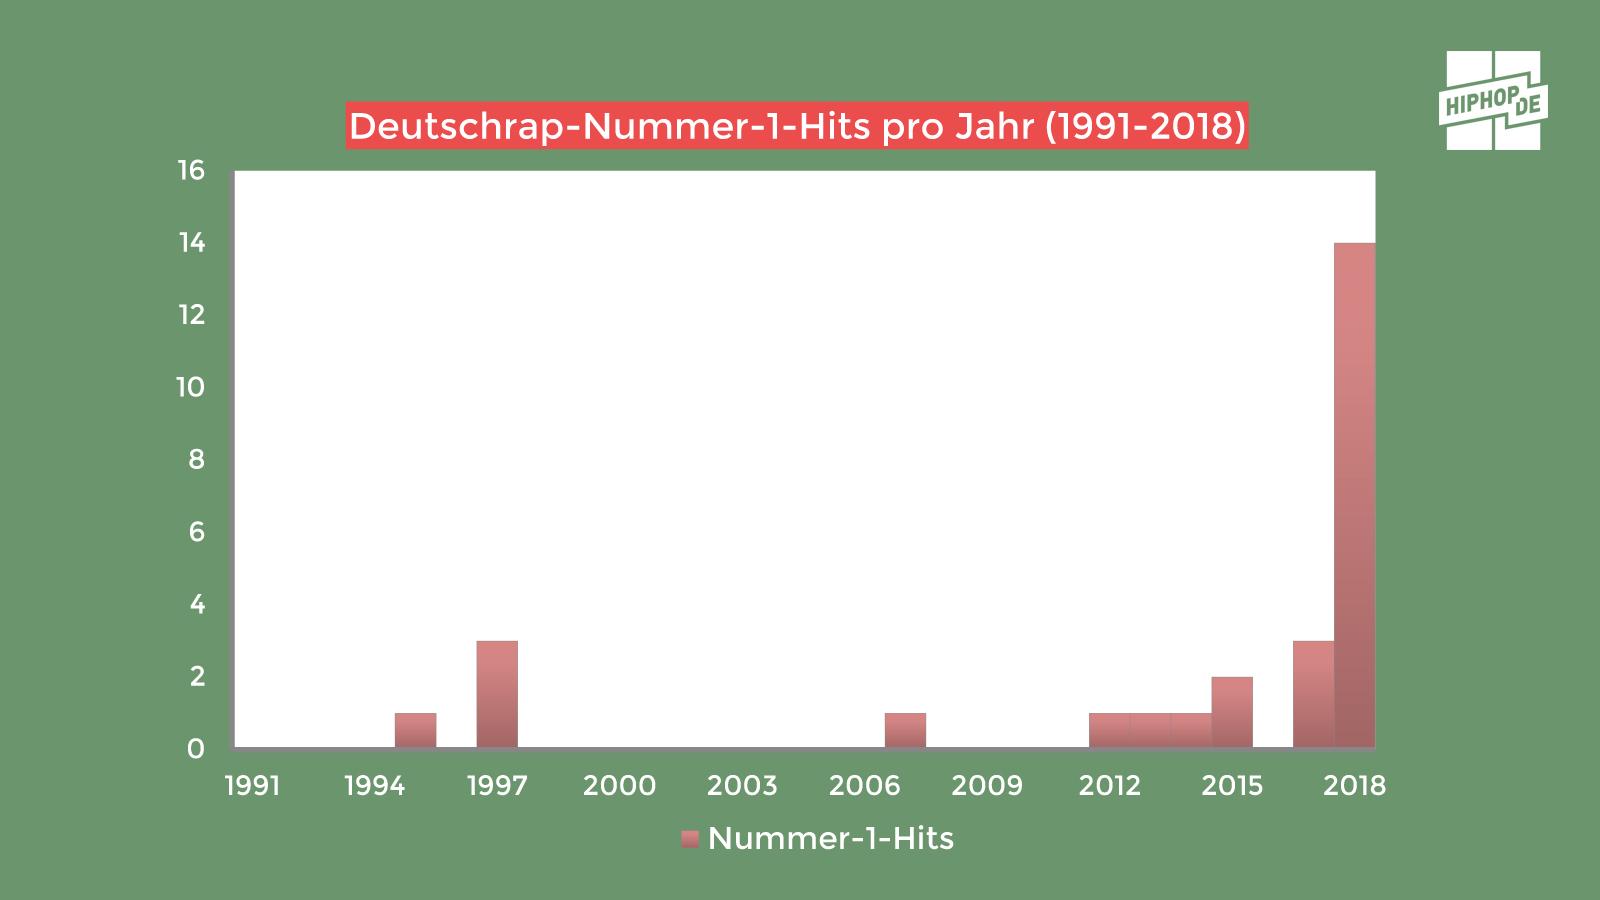 Nummer-1-Hits pro Jahr